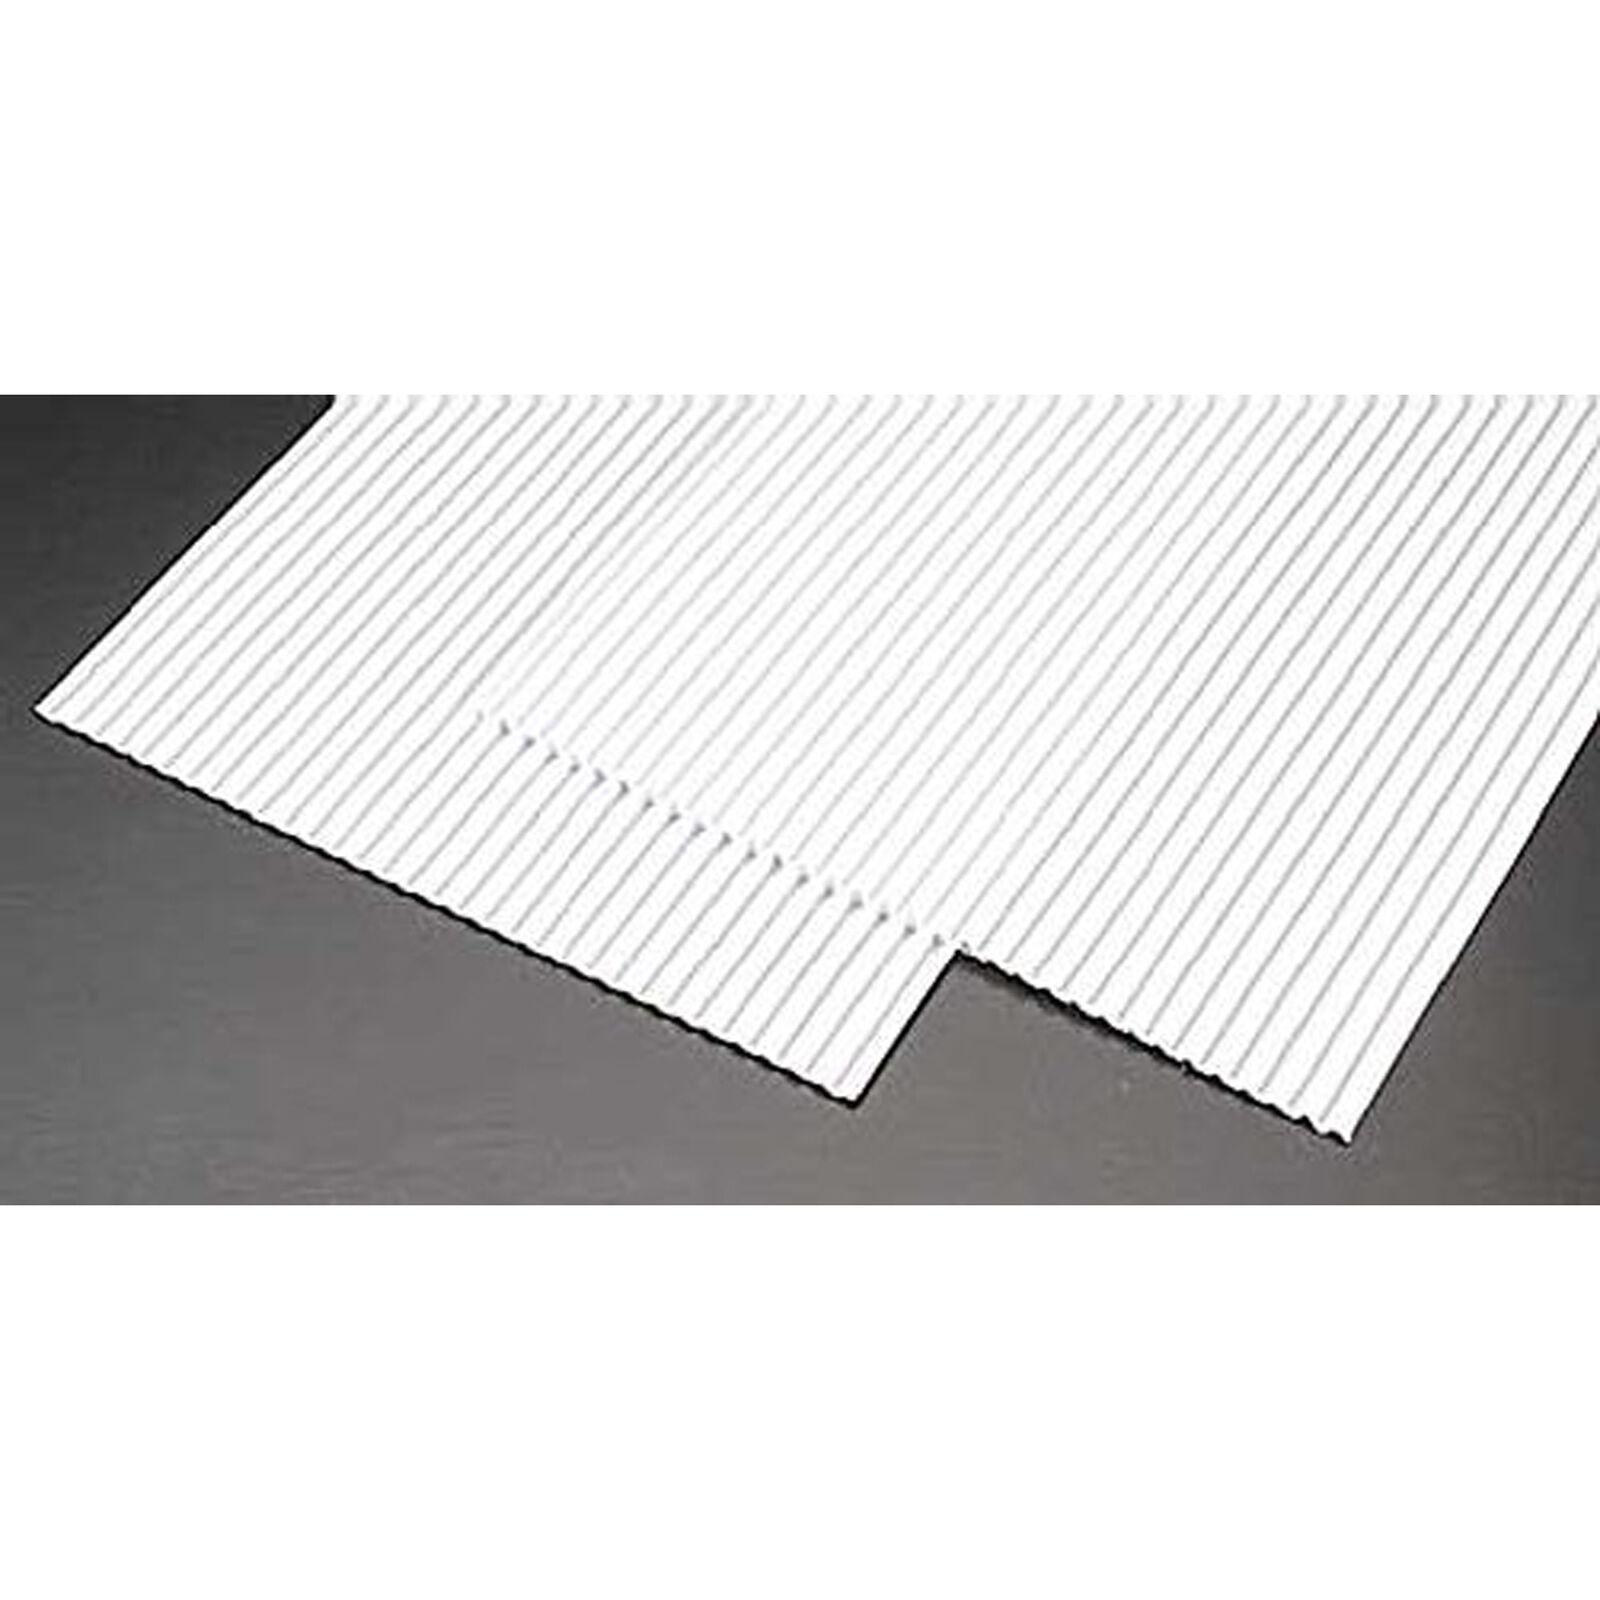 PS-25 #1 Corrugated Sheet (2)